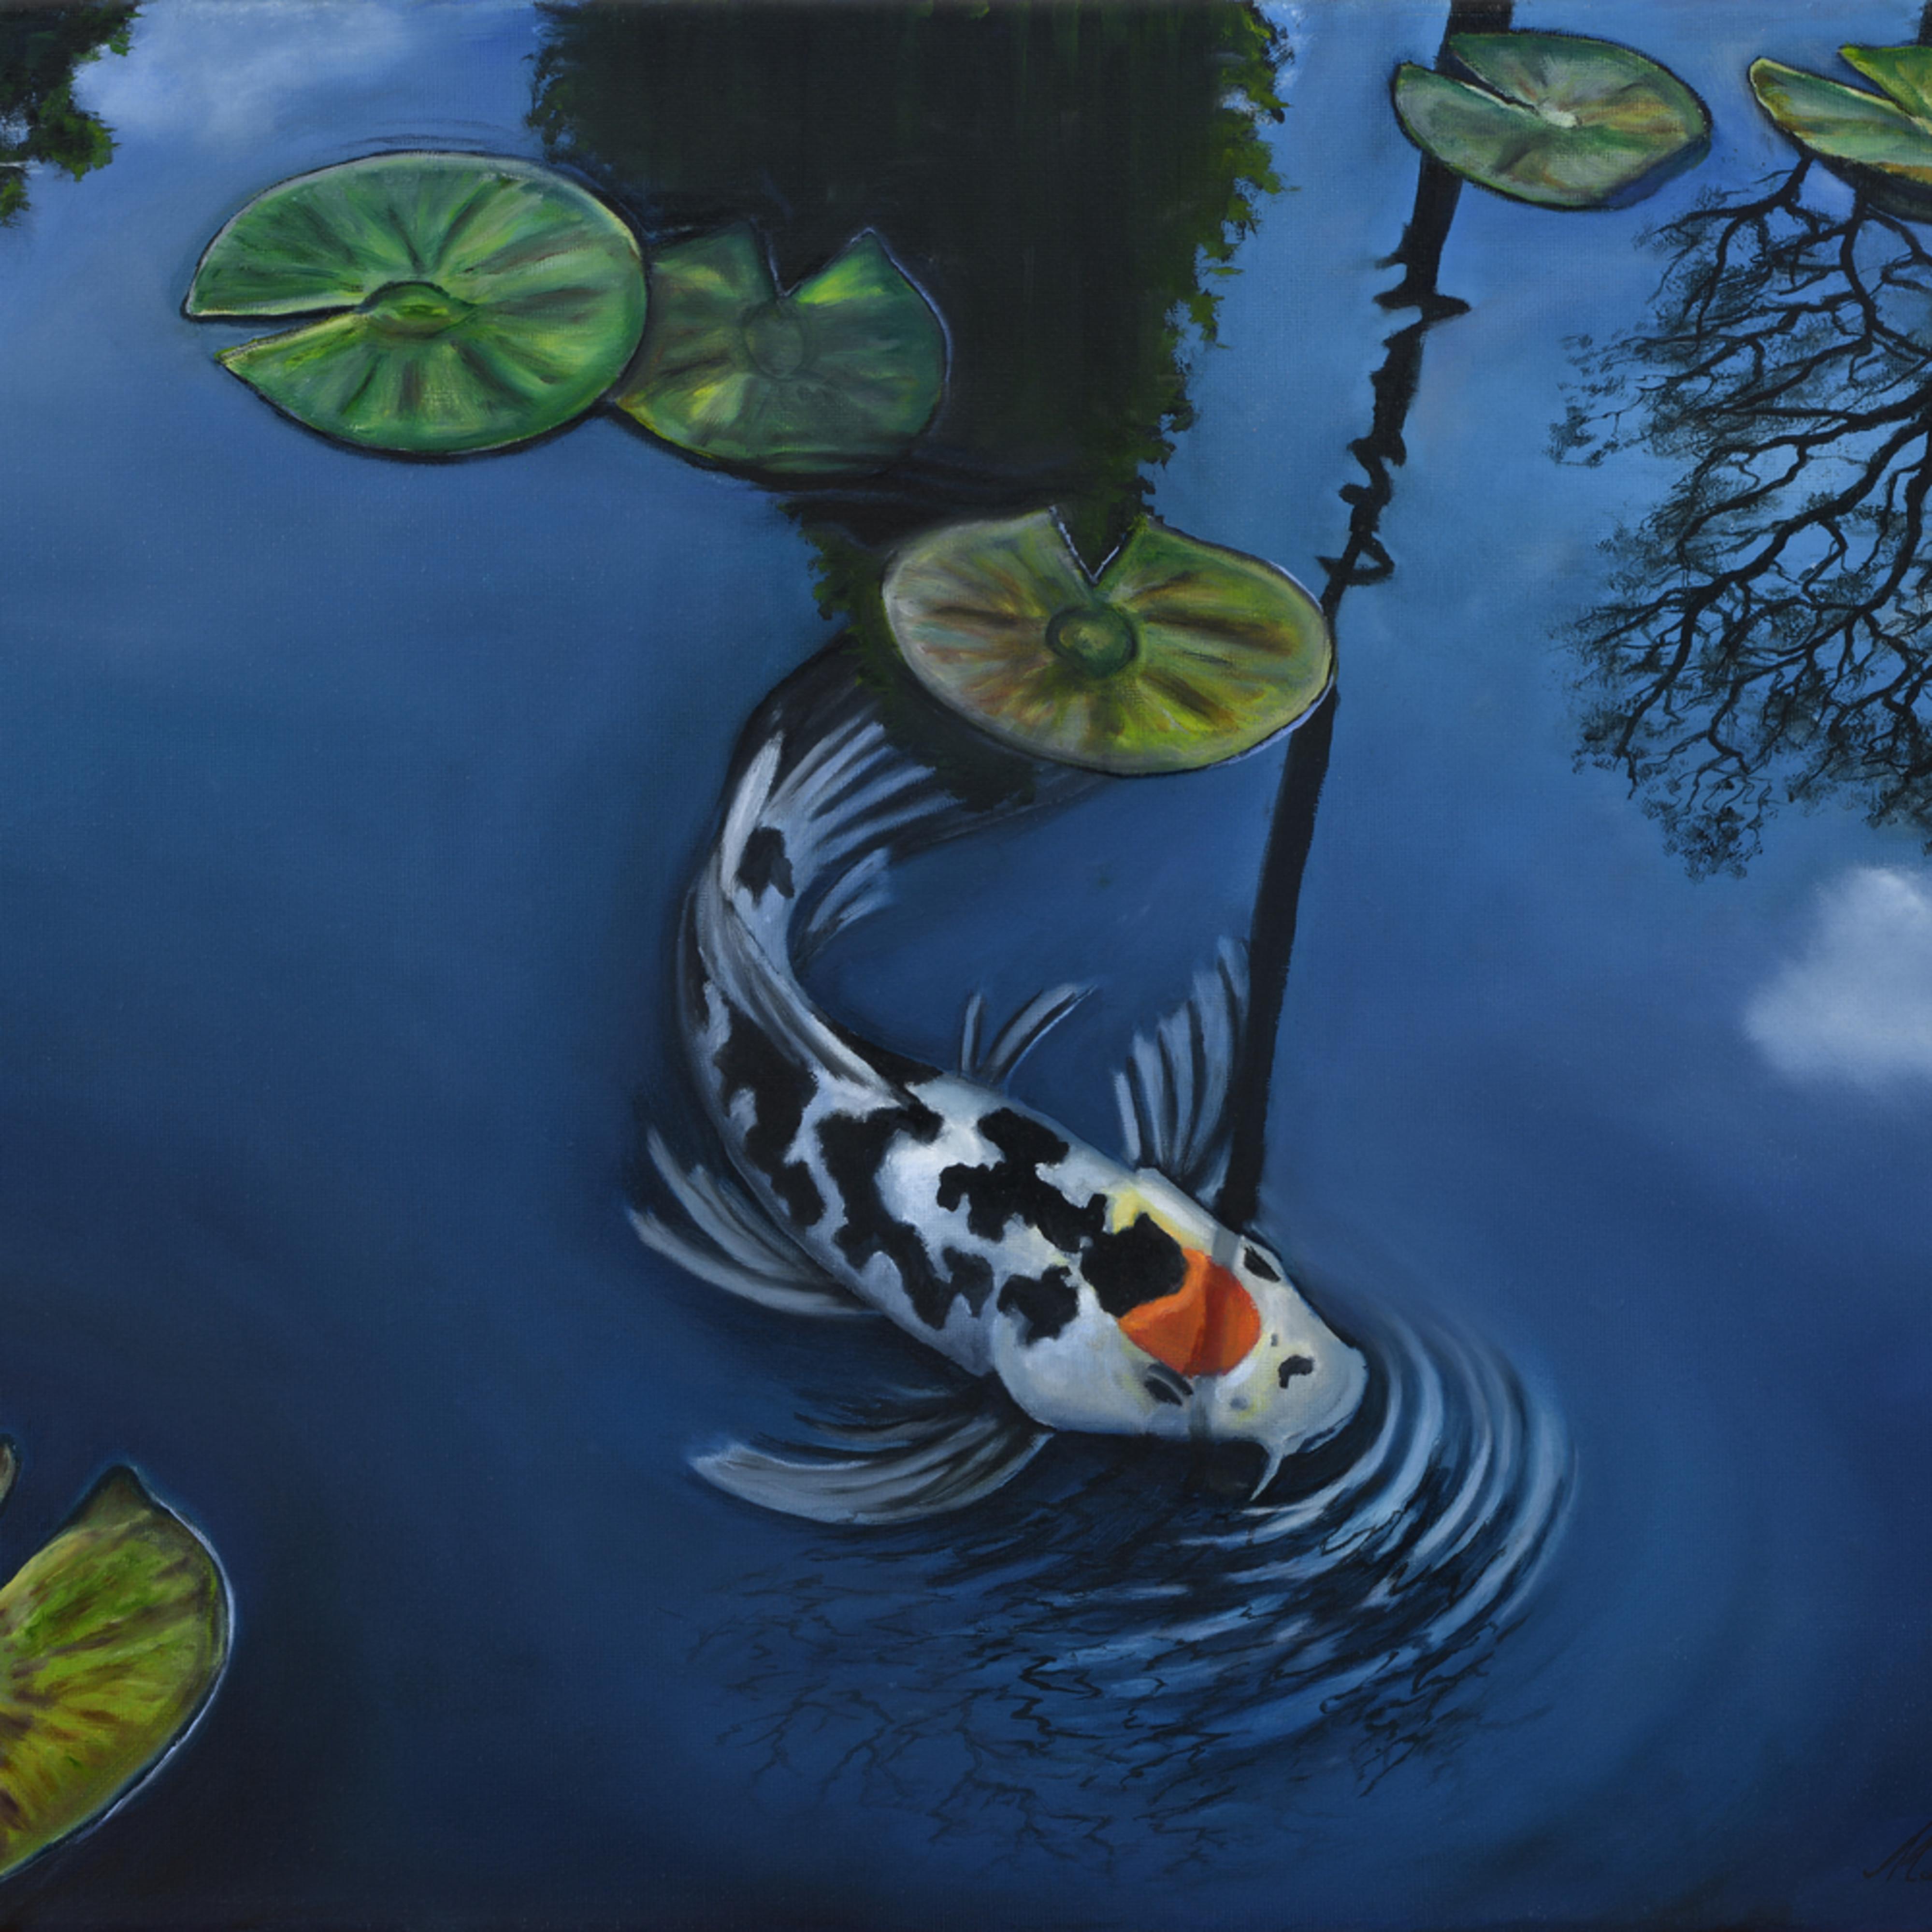 34  koi pond oil on canvas by monica marquez gatica mmg art studio thh5ib